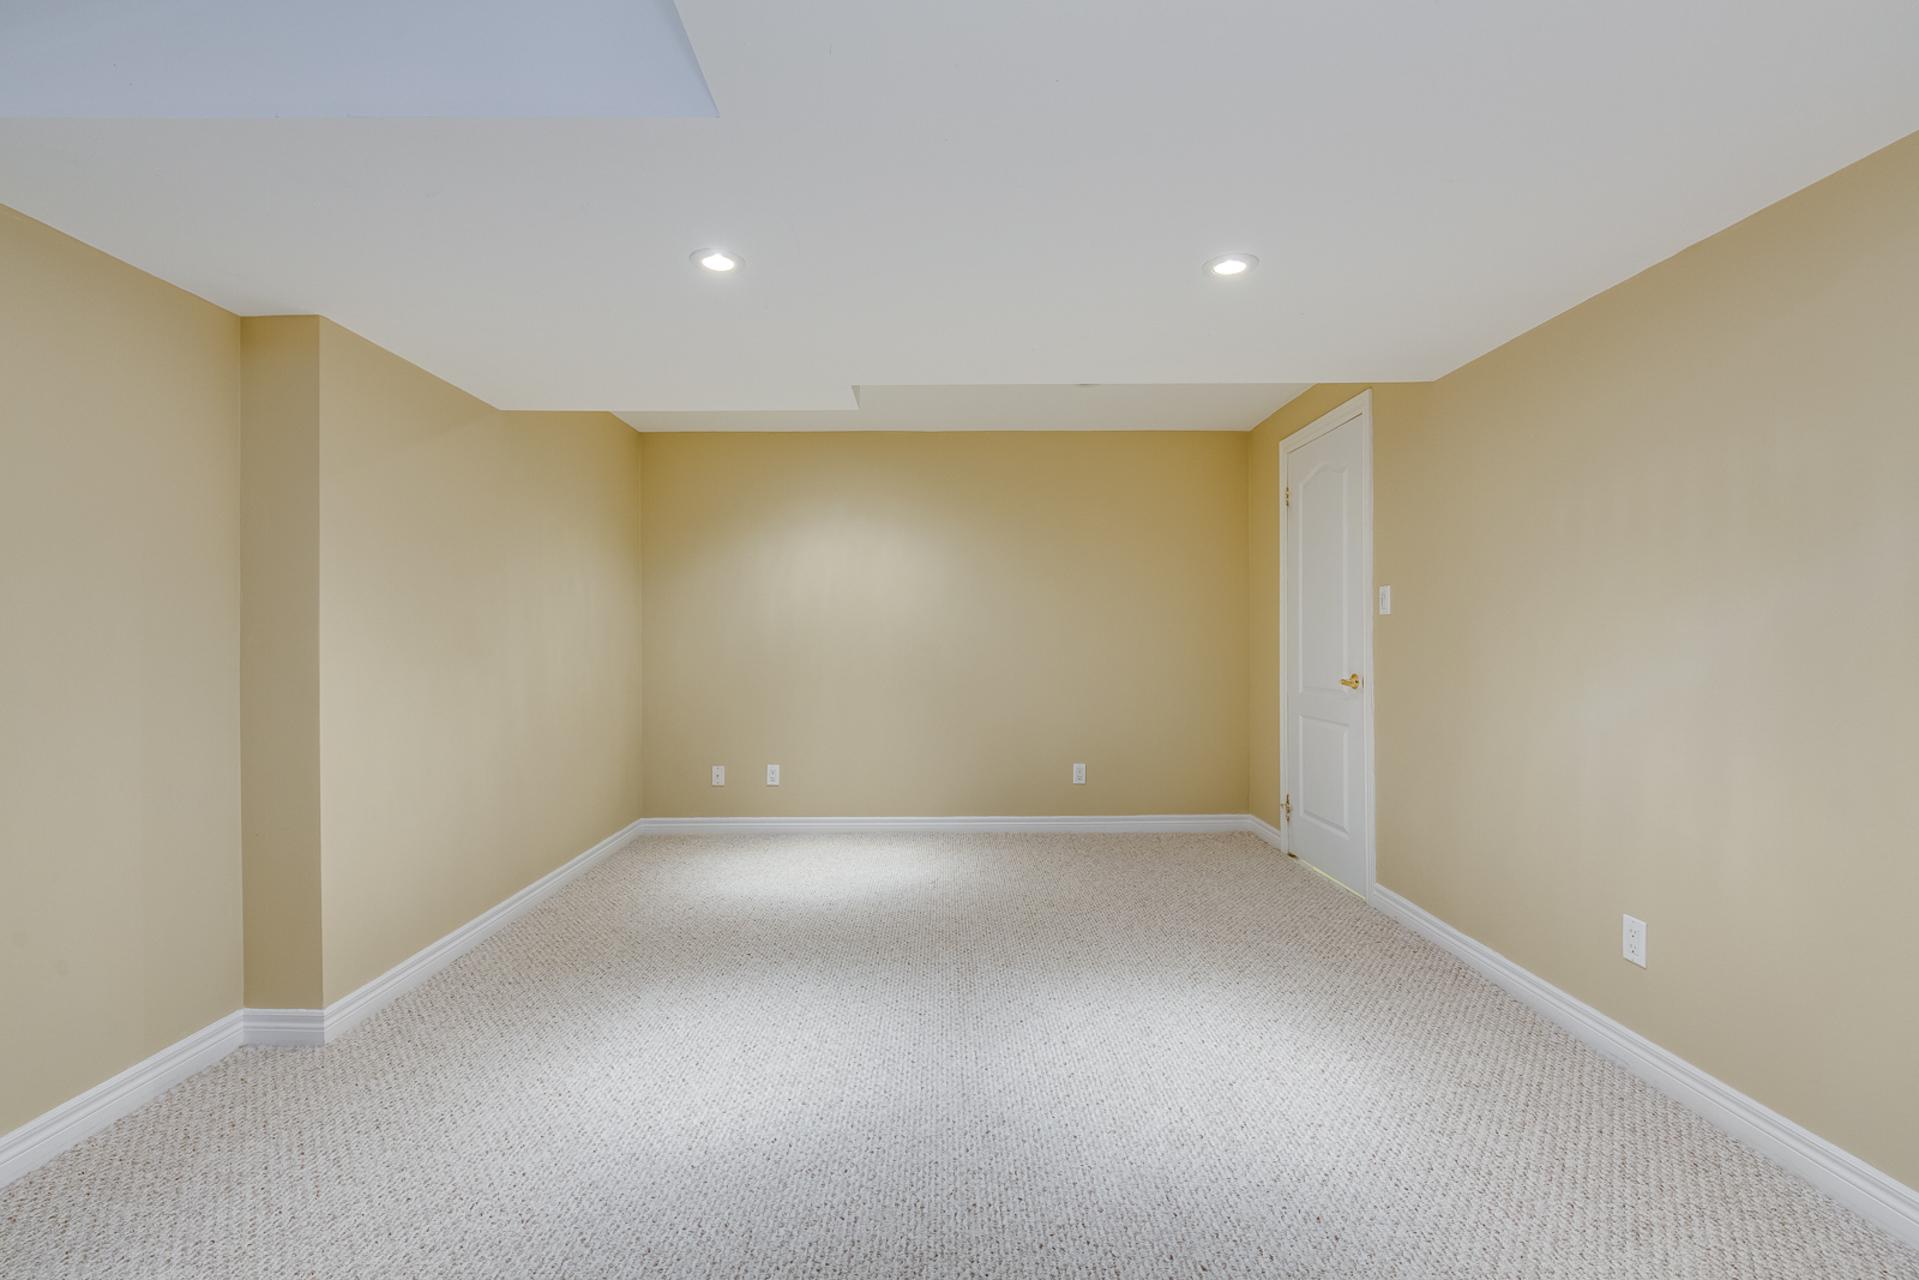 5th Bedroom - 1806 Glenvista Dr, Oakville - Elite3 & Team at  Glenvista Drive, Iroquois Ridge North, Oakville